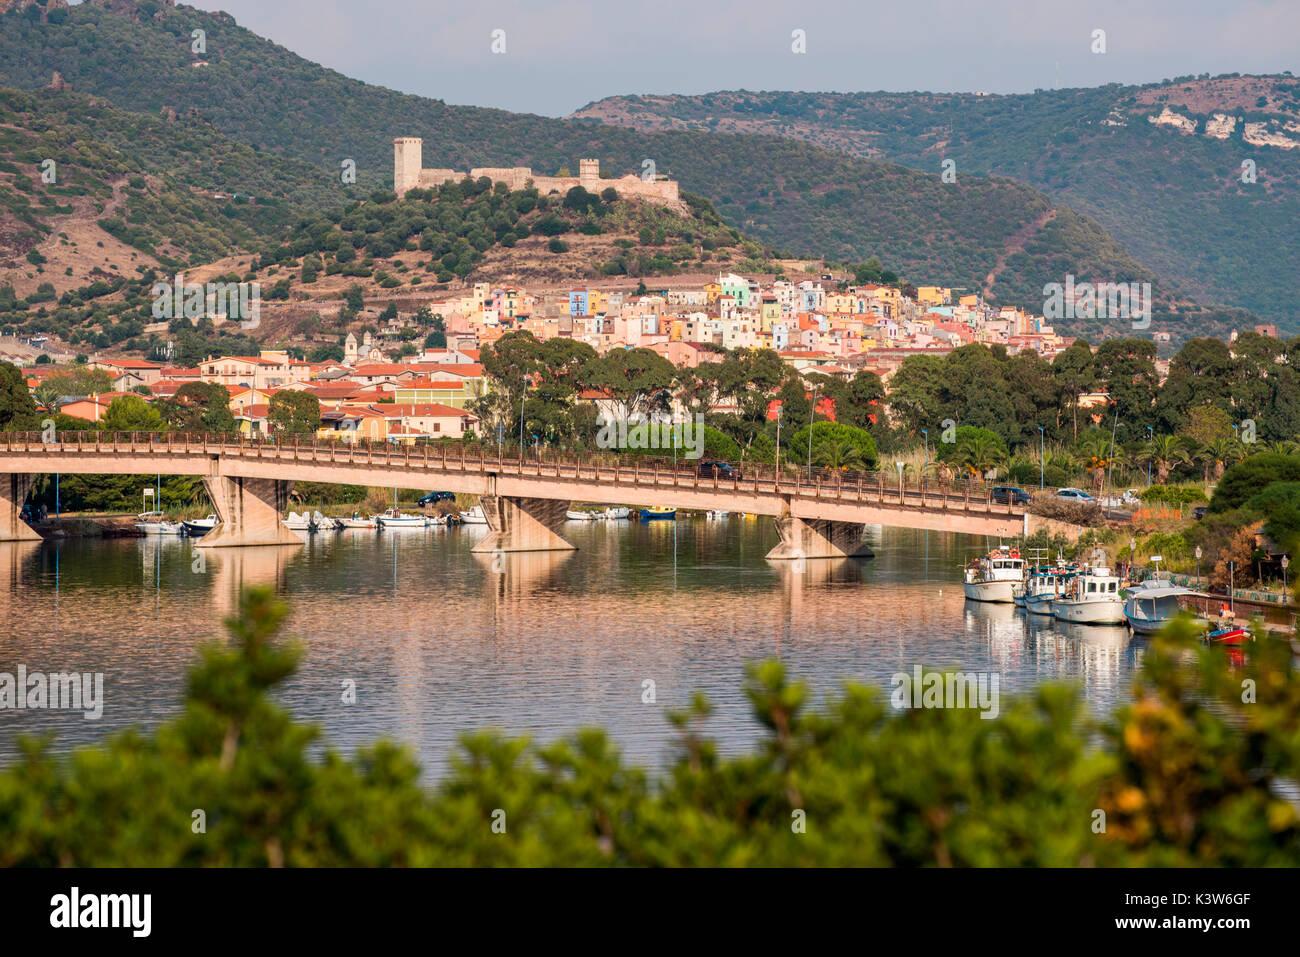 Bosa, provincia de Oristano, Cerdeña, Italia, Europa. Foto de stock